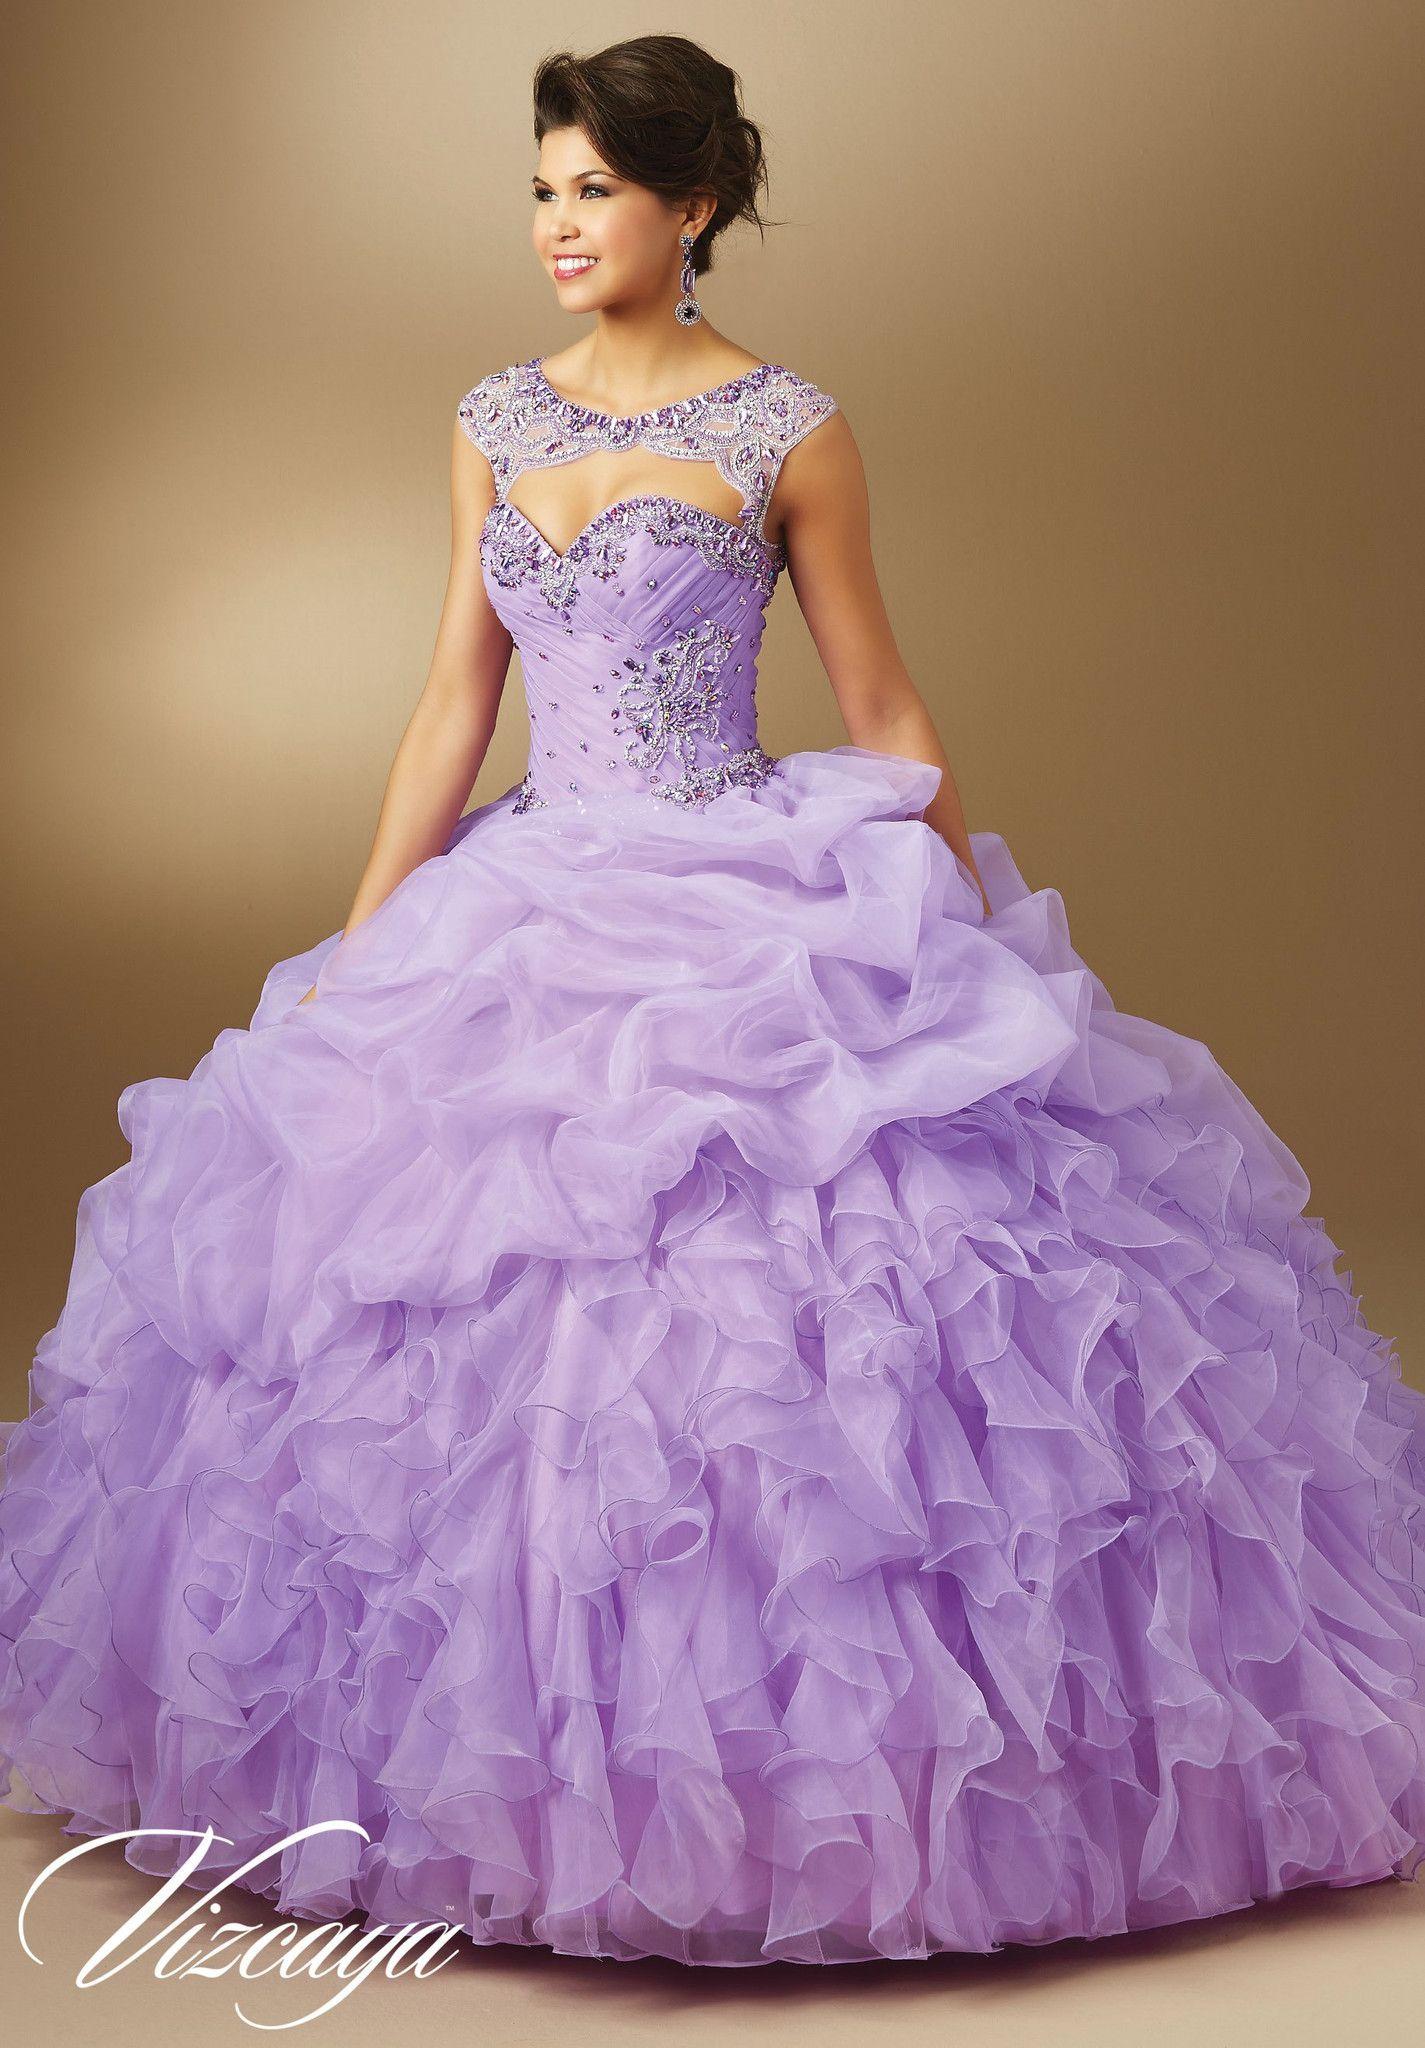 Mori Lee Quinceanera Dress 89048 | Fiestas de 15 años, Fiestas de 15 ...